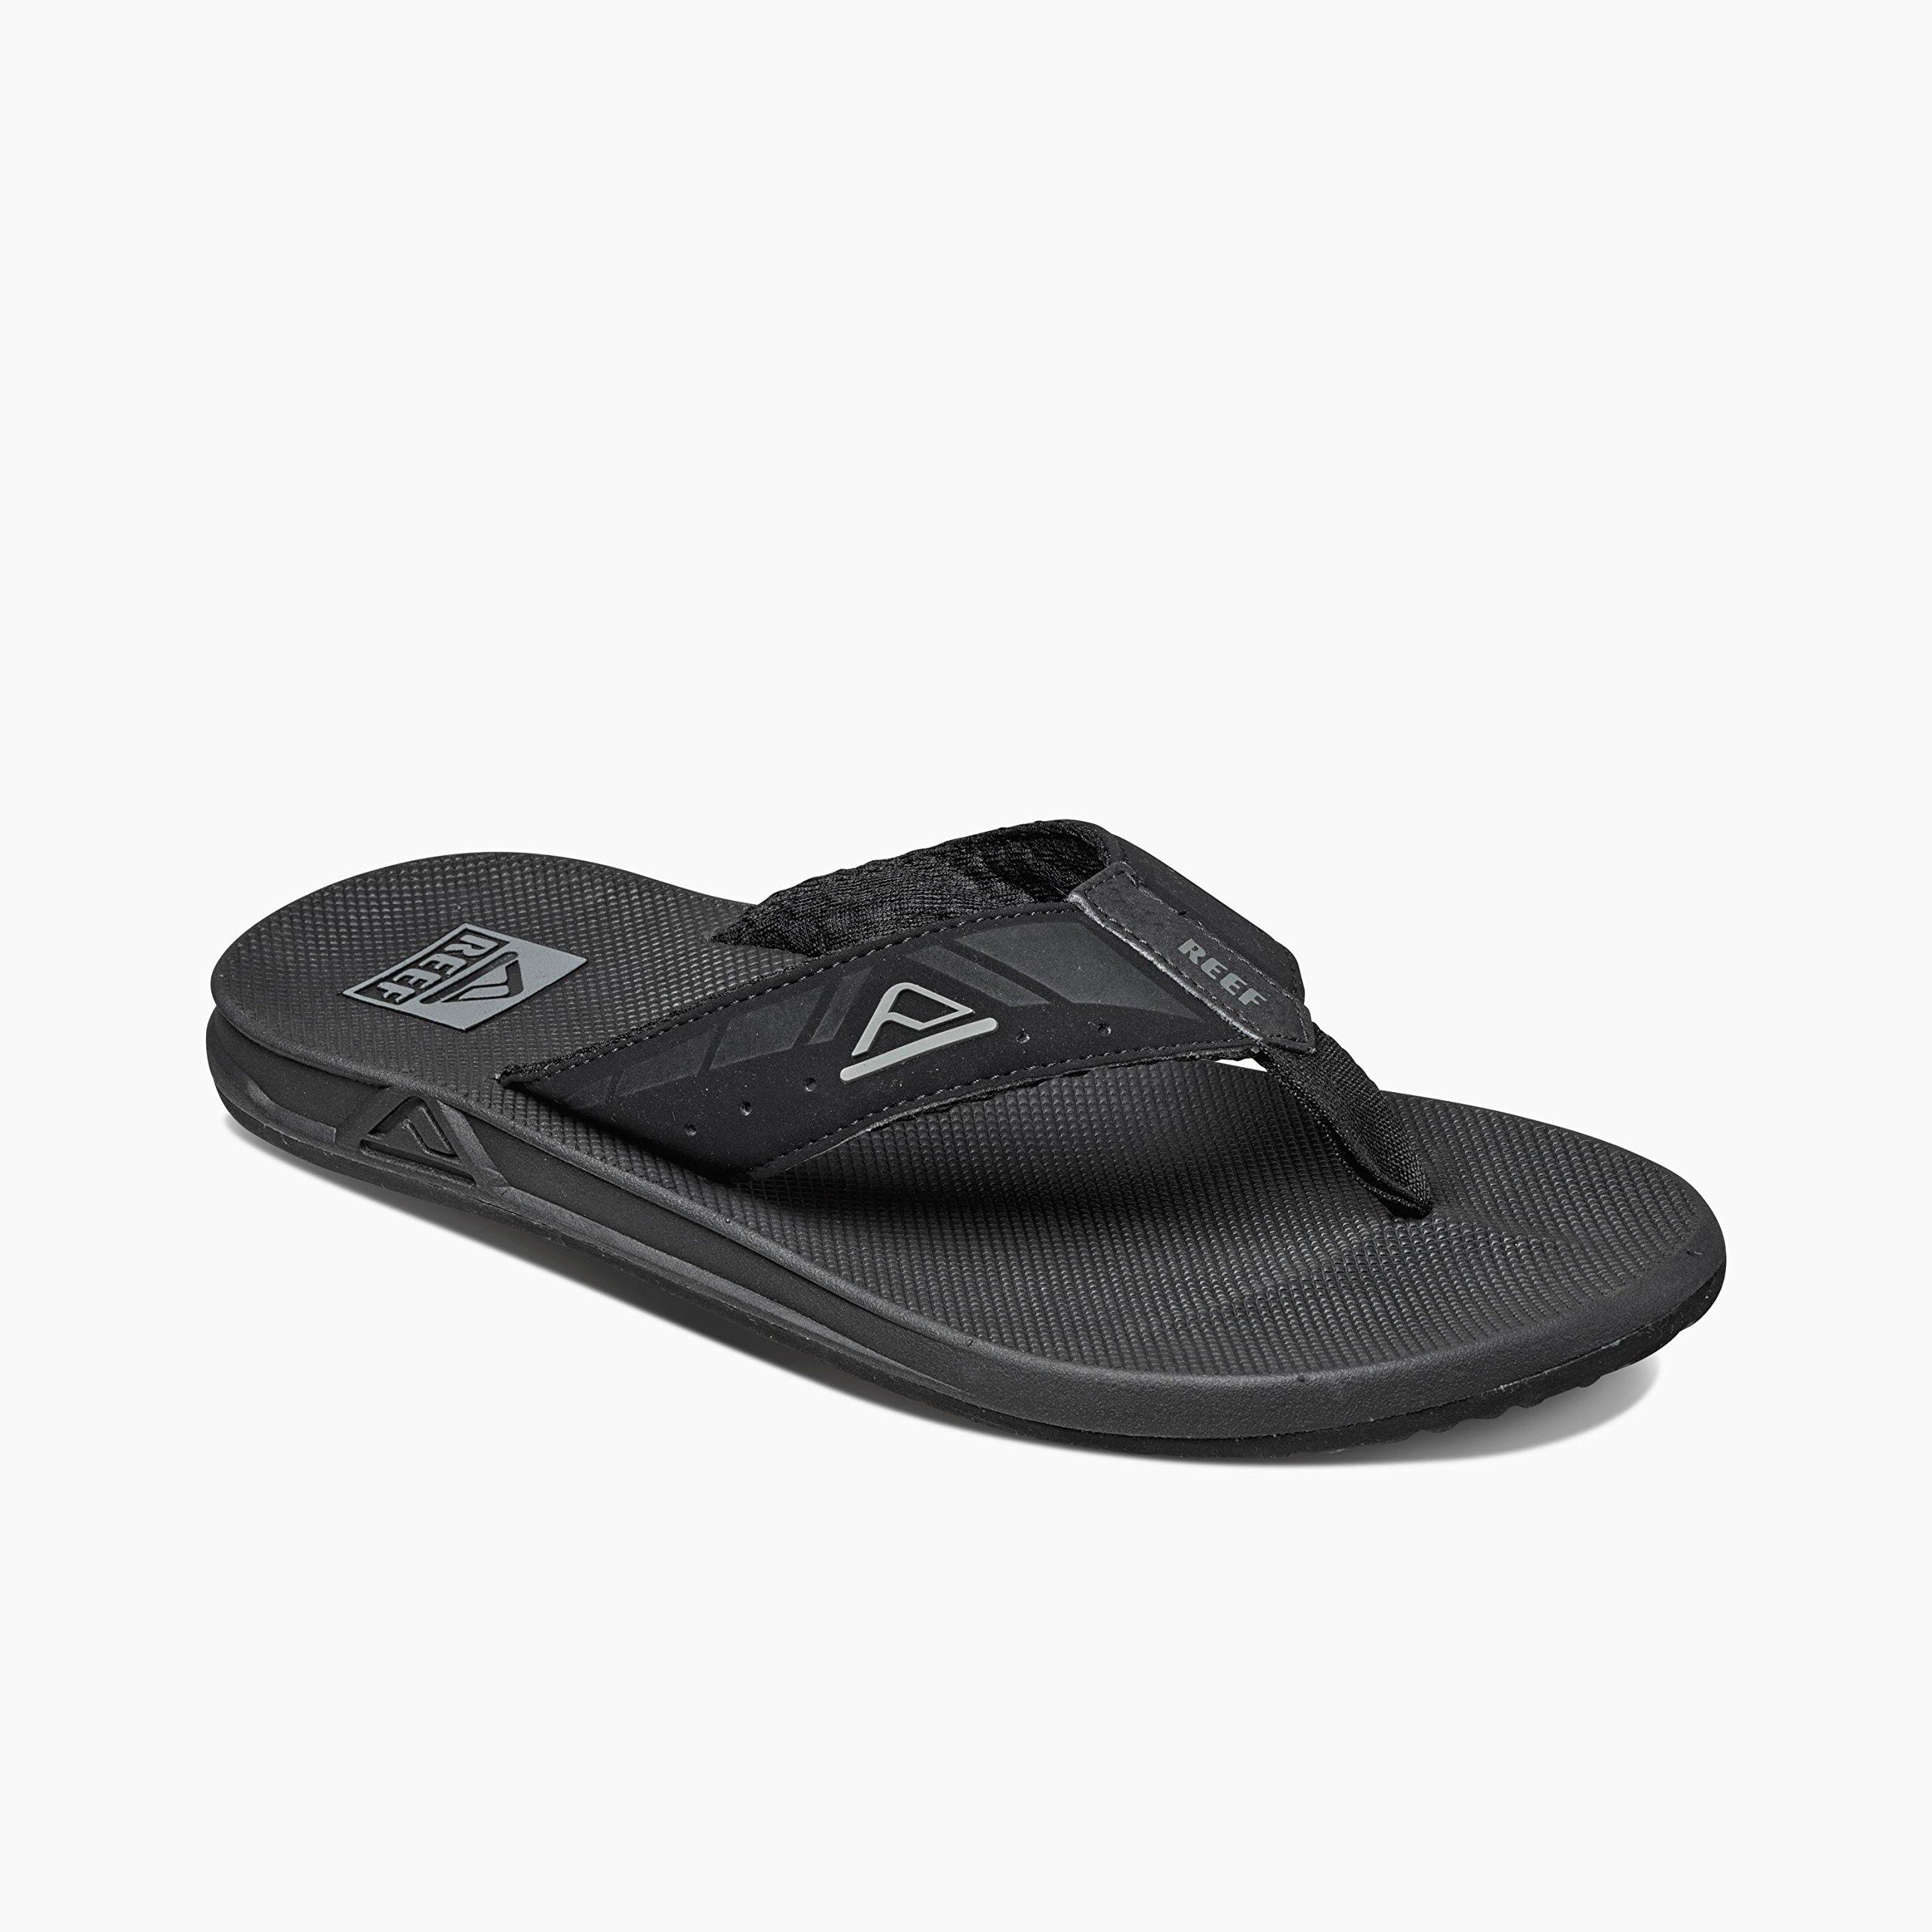 9f4912902b10 Amazon.com  REEF  Mens Black Sandals